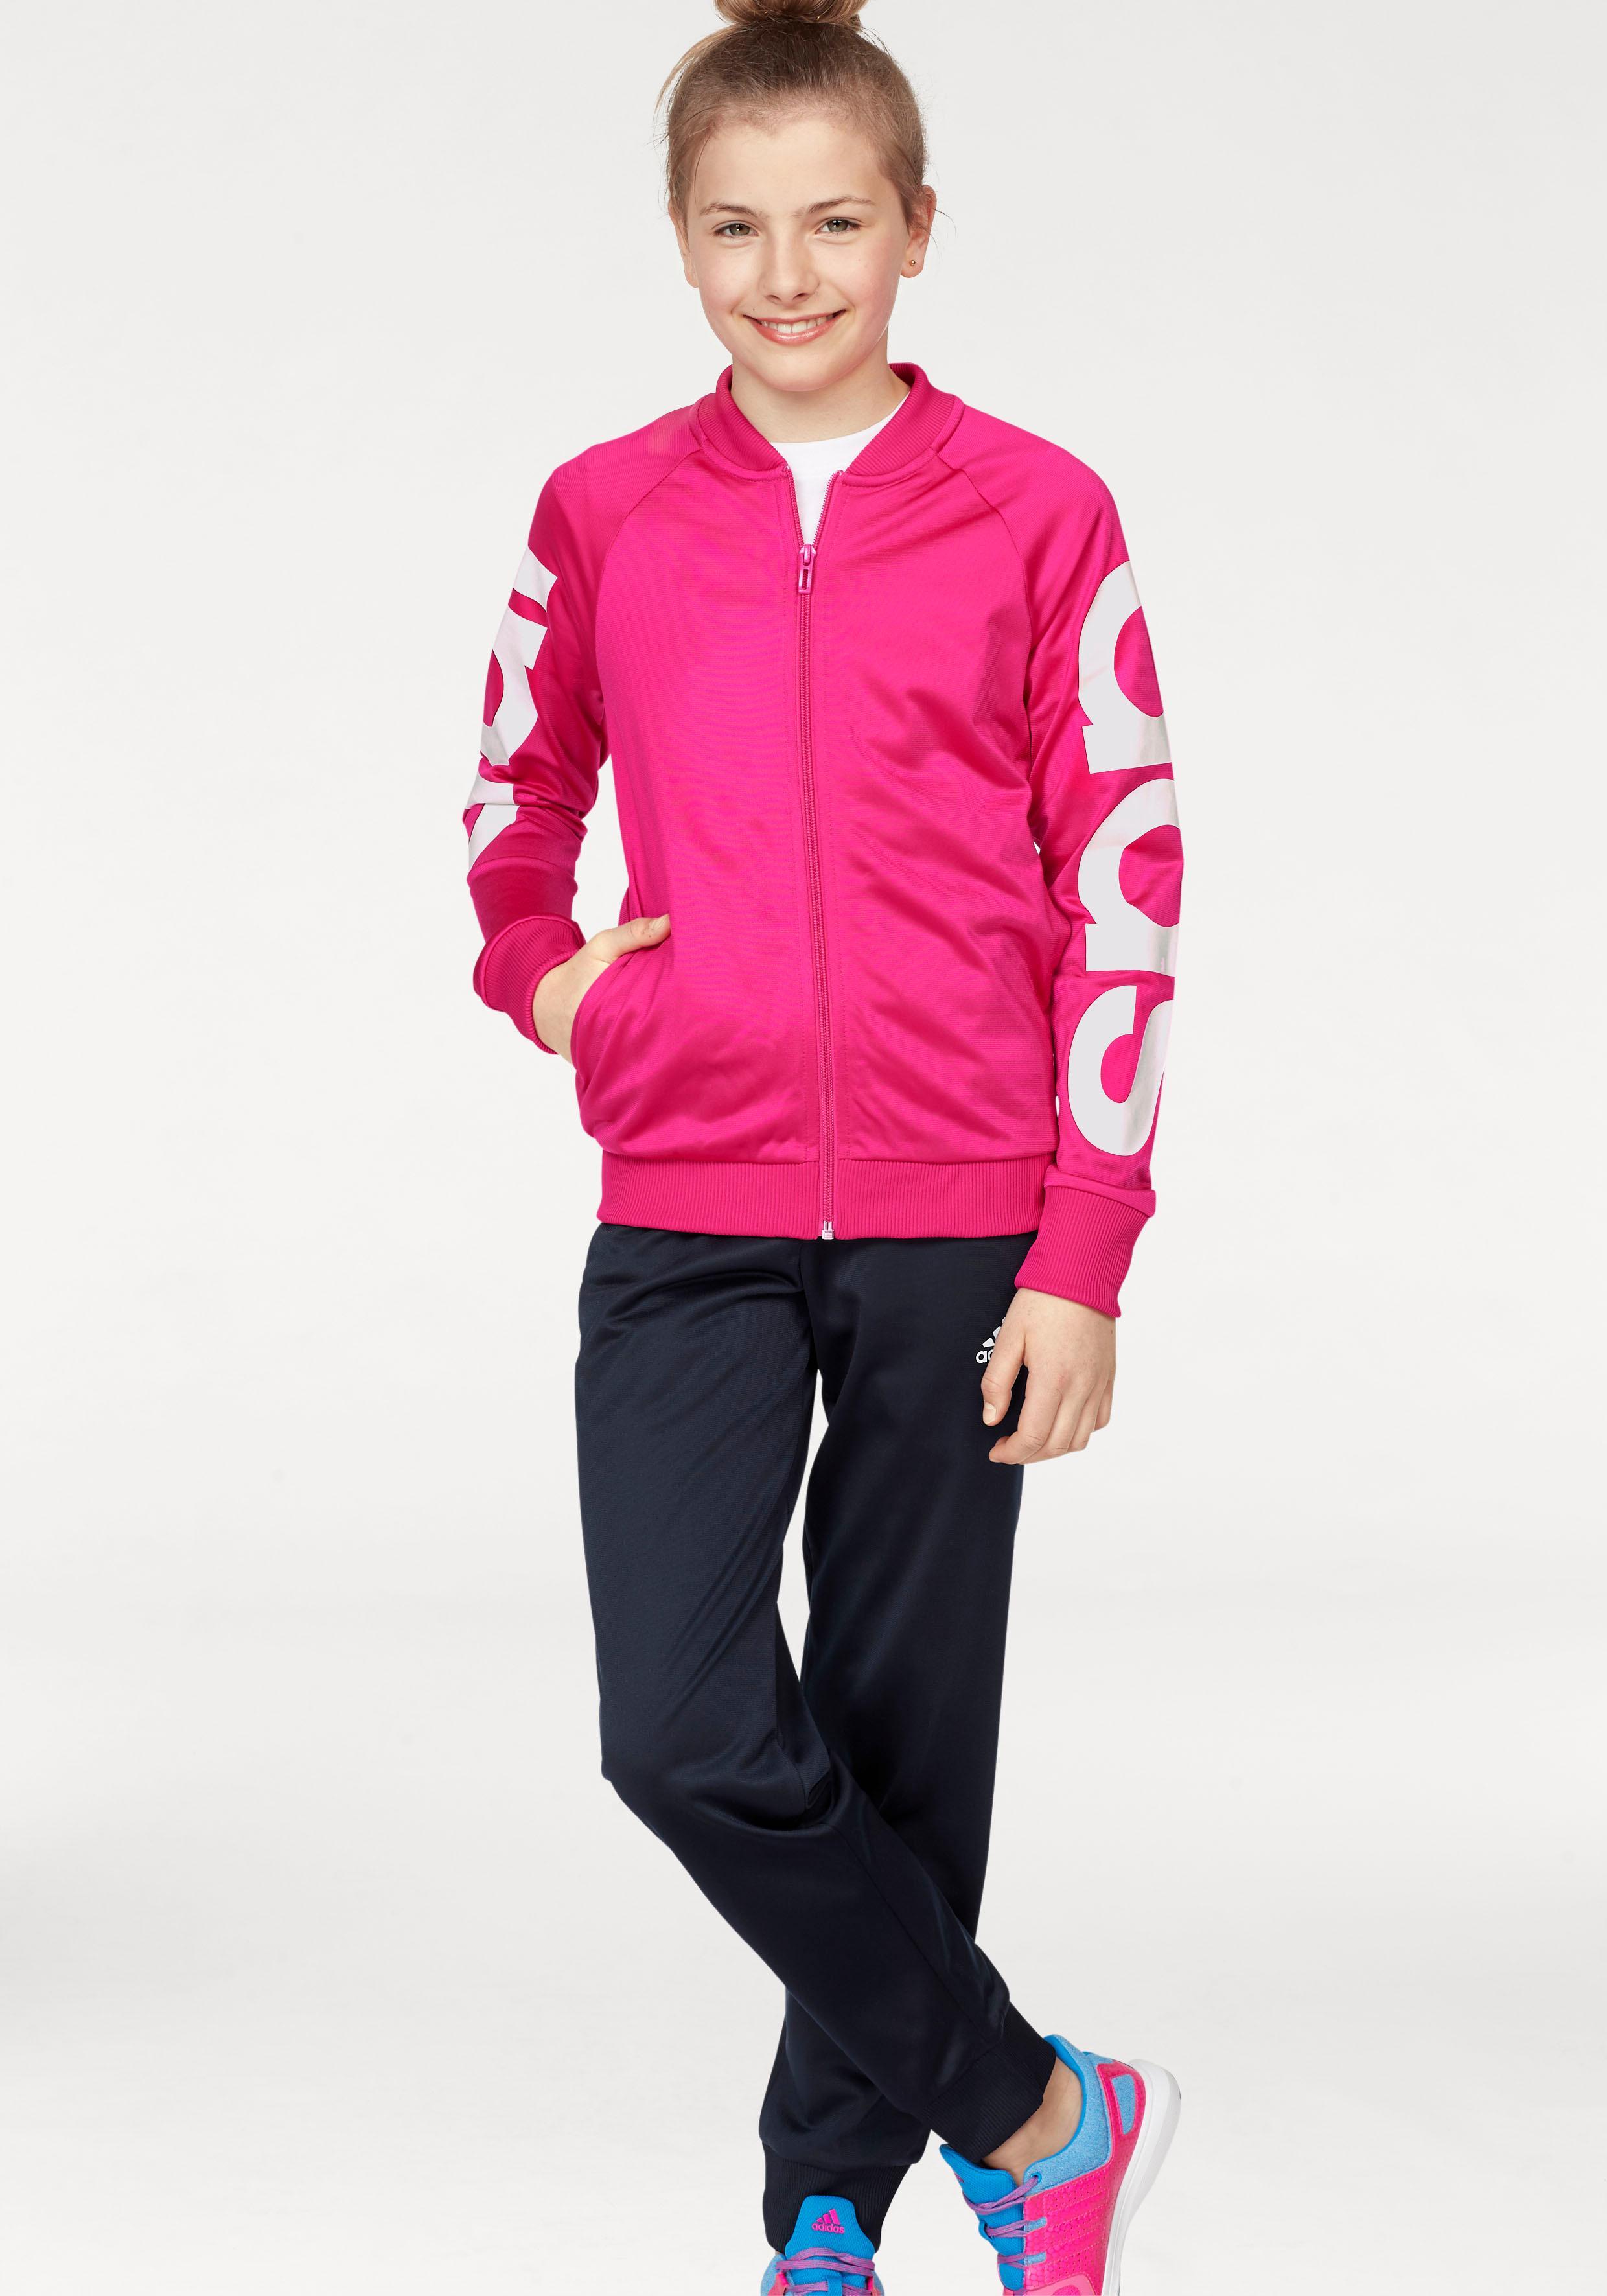 adidas Performance Trainingsanzug  YOUTH GIRLS TRACKSUIT  (Packung, 2 tlg.) Preisvergleich